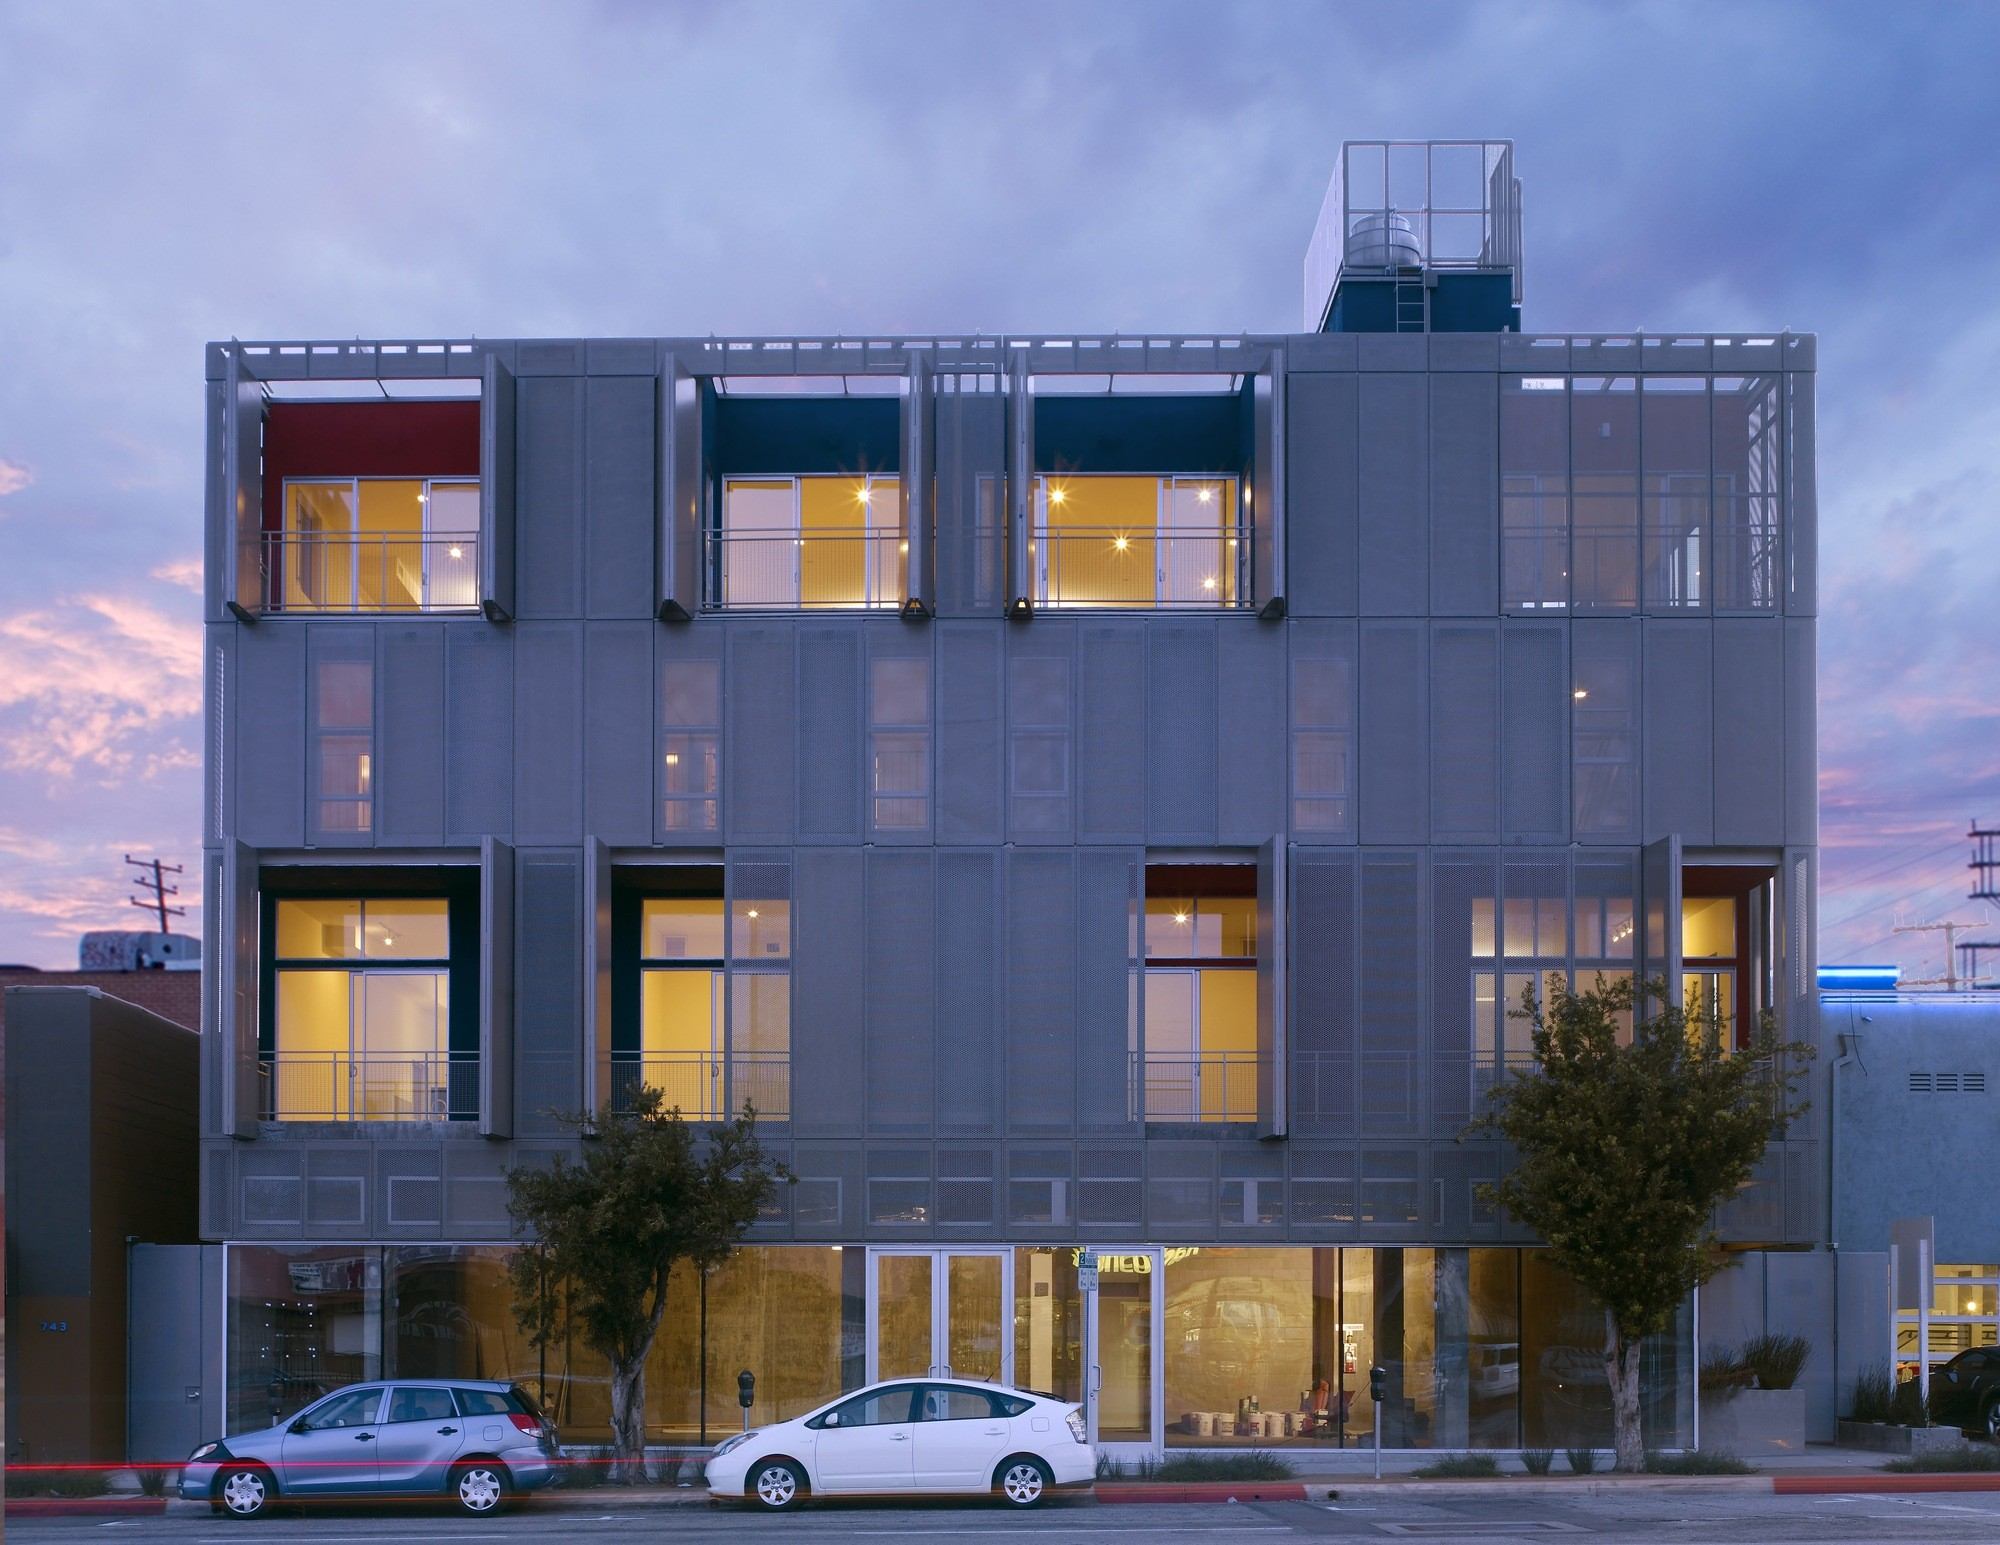 Brooks + Scarpa, Witold Rybczynski Win Cooper-Hewitt National Design Award, AIA 2014 Housing Award Recipient: Cherokee Studios / Brooks + Scarpa